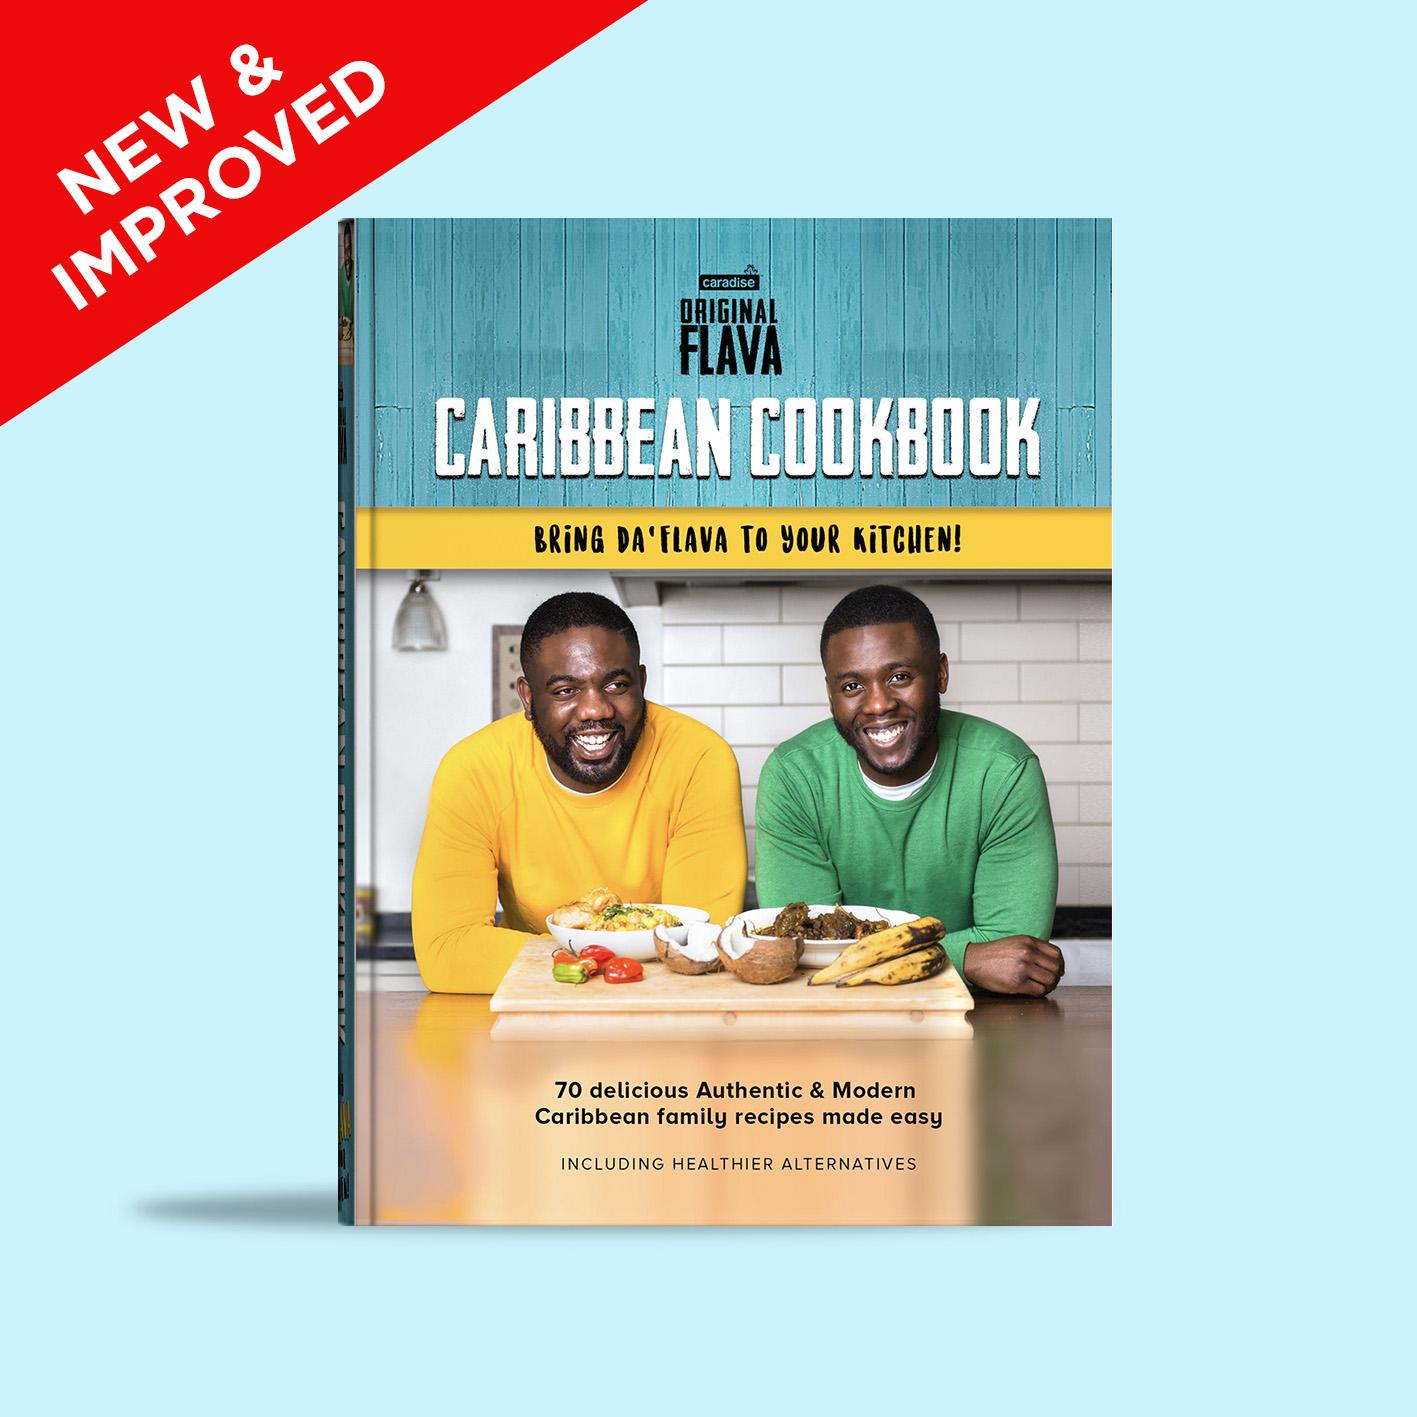 Original Flava Cookbook - Original Flava